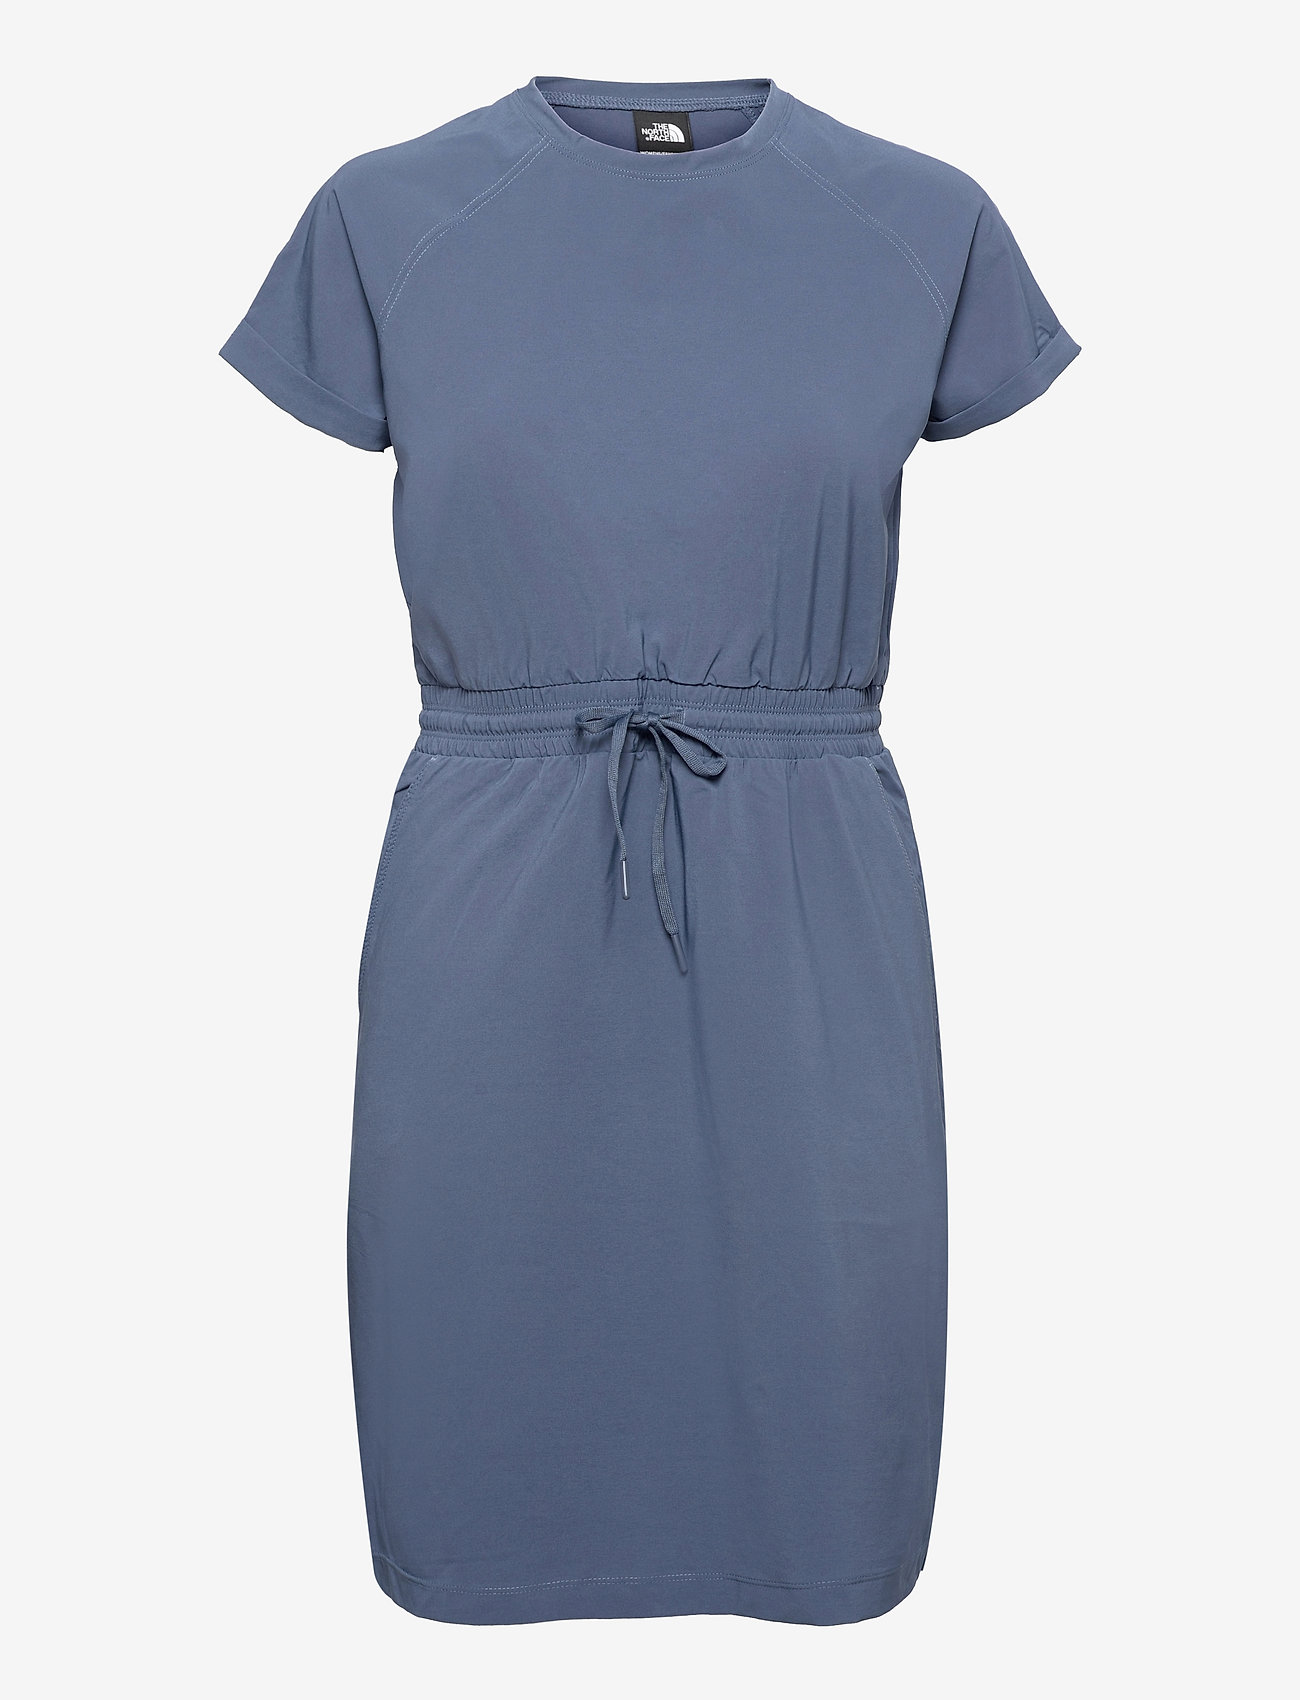 The North Face - W NSW DRESS - sommerkjoler - vintage indigo - 0